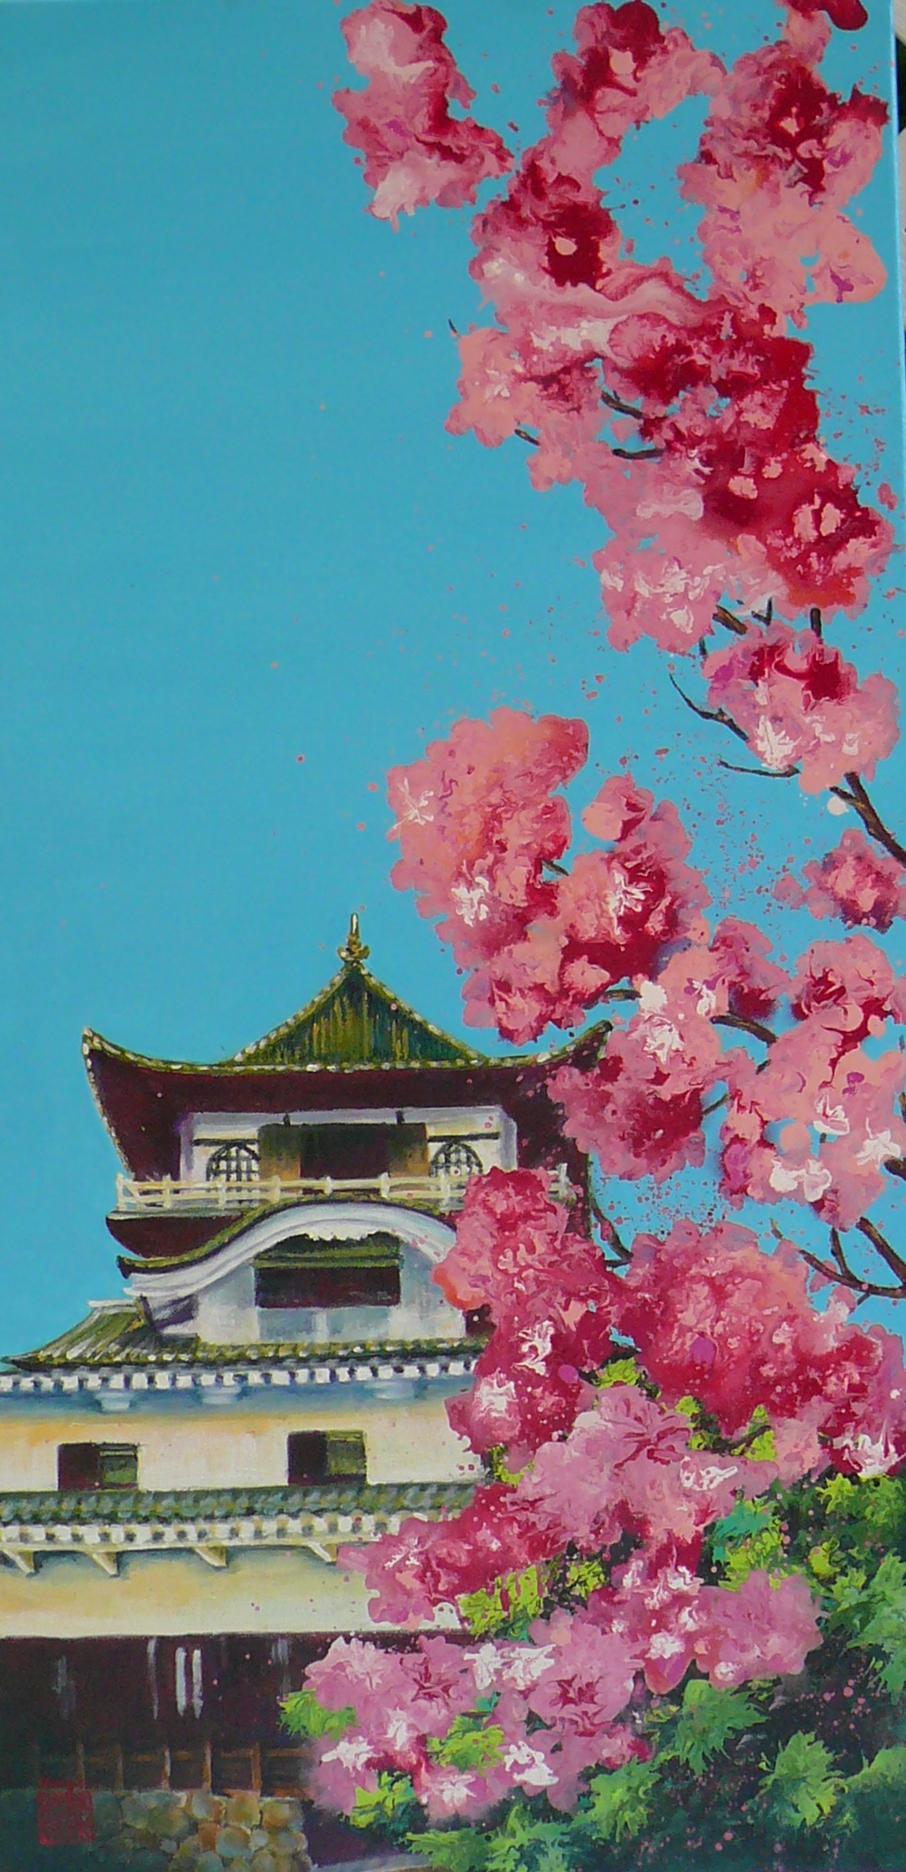 Inuyama Castle in April 92 x 46cm